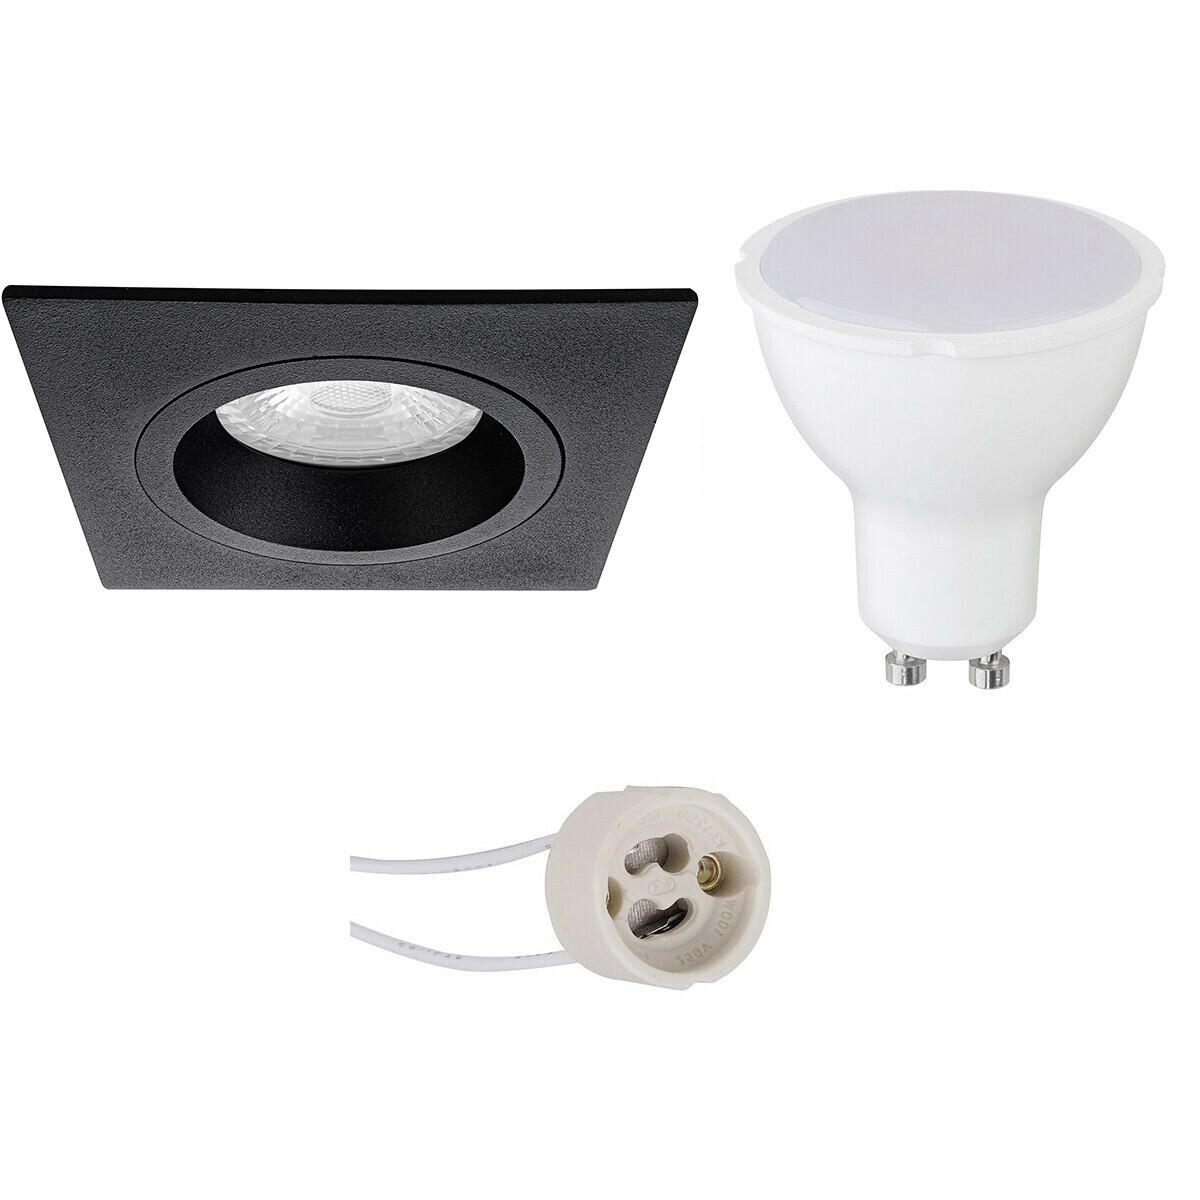 LED Spot Set - Pragmi Rodos Pro - GU10 Fitting - Dimbaar - Inbouw Vierkant - Mat Zwart - 6W - Helder